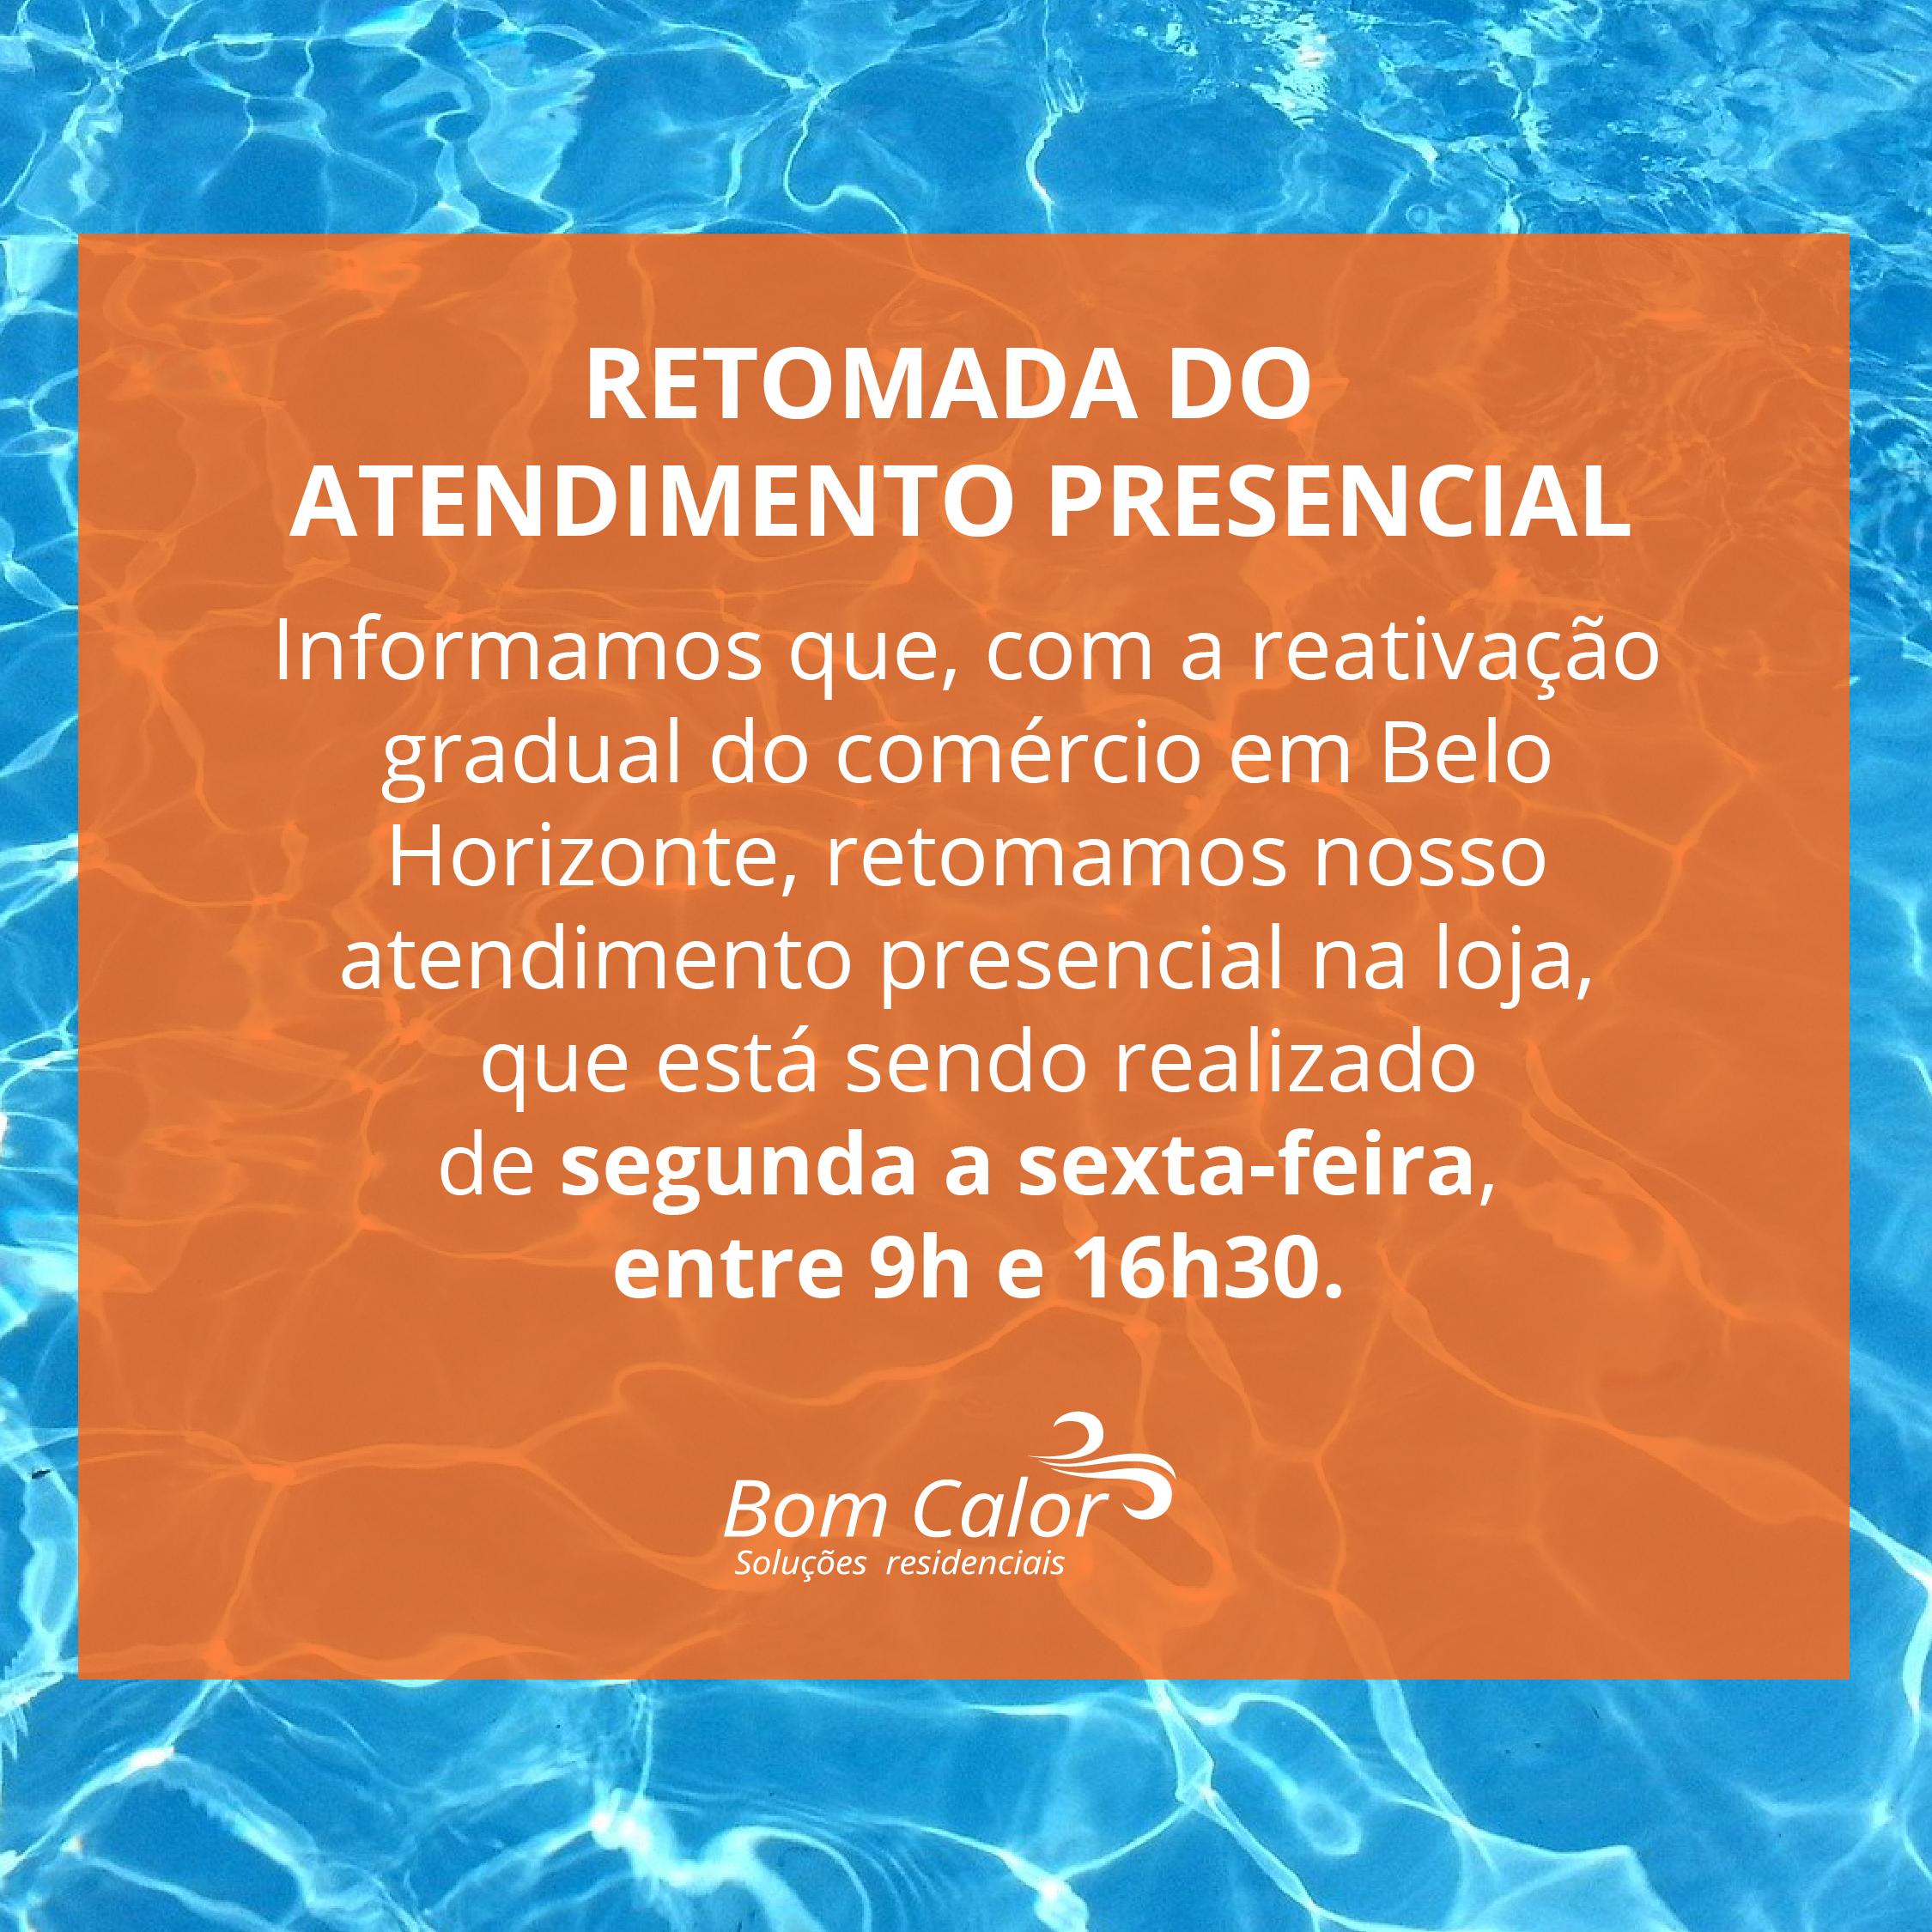 nota_RETOMADA ATENDIMENTO PRESENCIAL-01